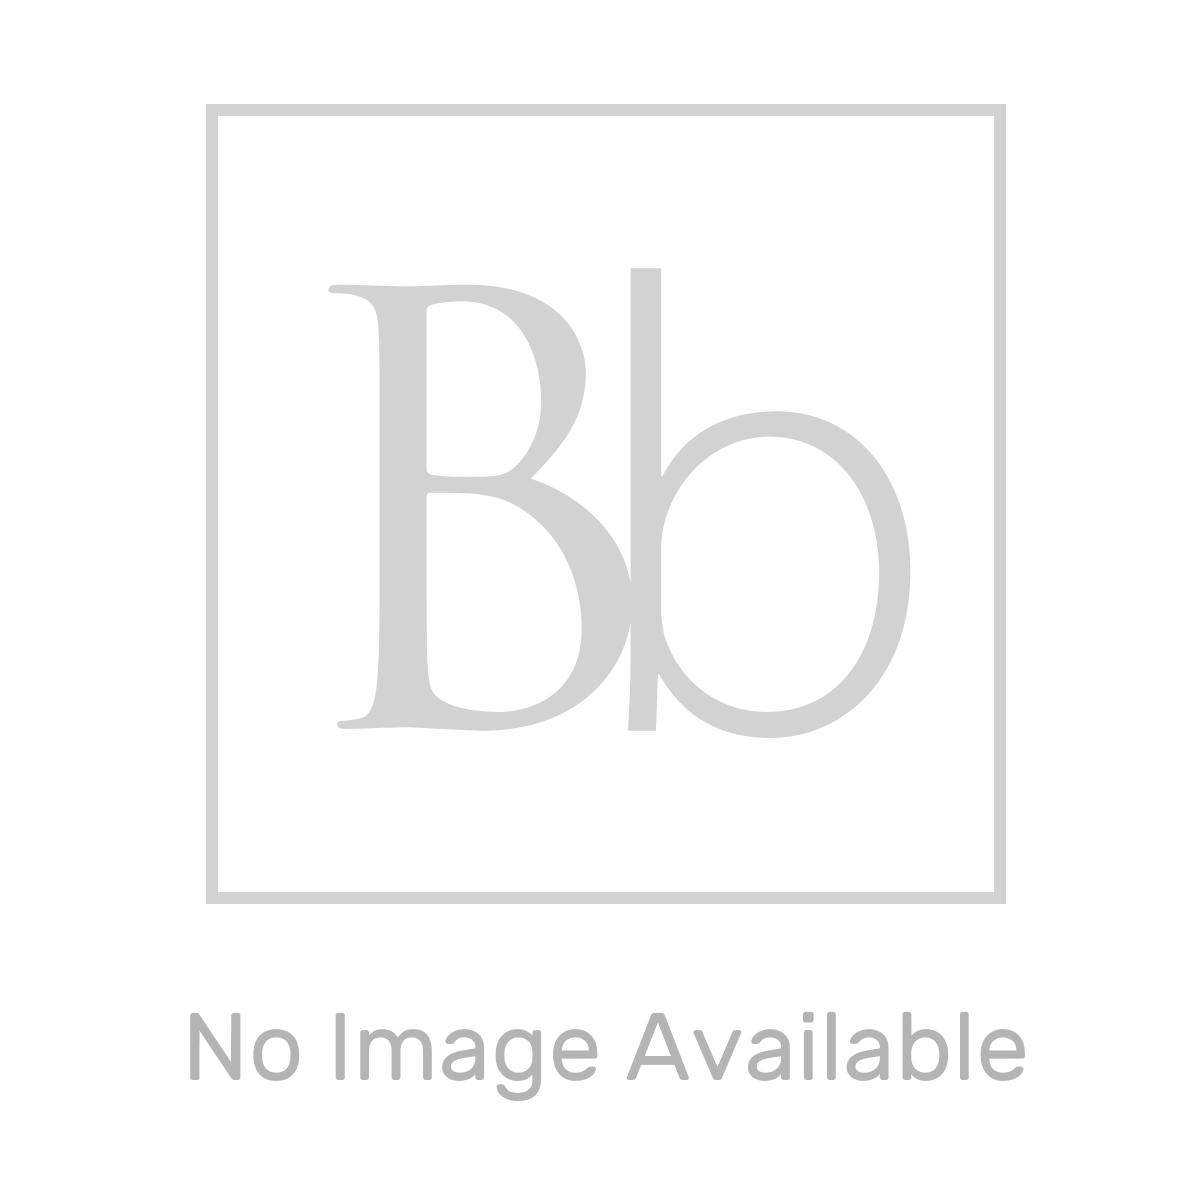 Nuie Athena Stone Grey 2 Door Floor Standing Vanity Unit with 40mm Profile Basin 600mm Line Drawing